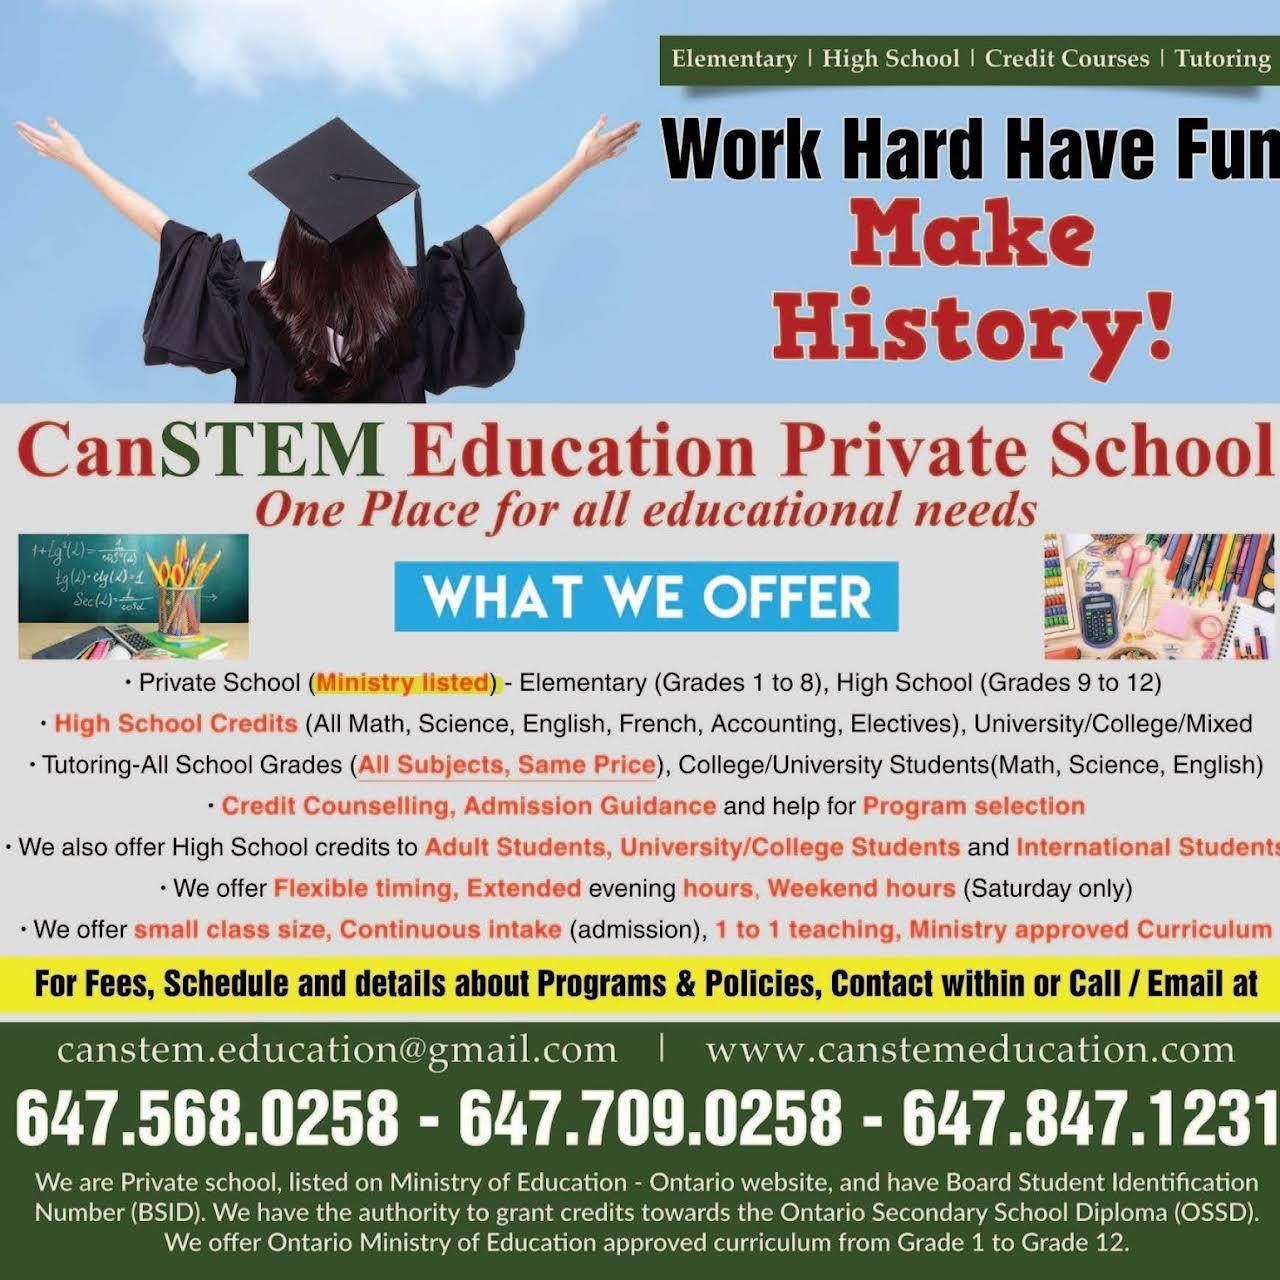 CanSTEM Education Private School - School in Brampton